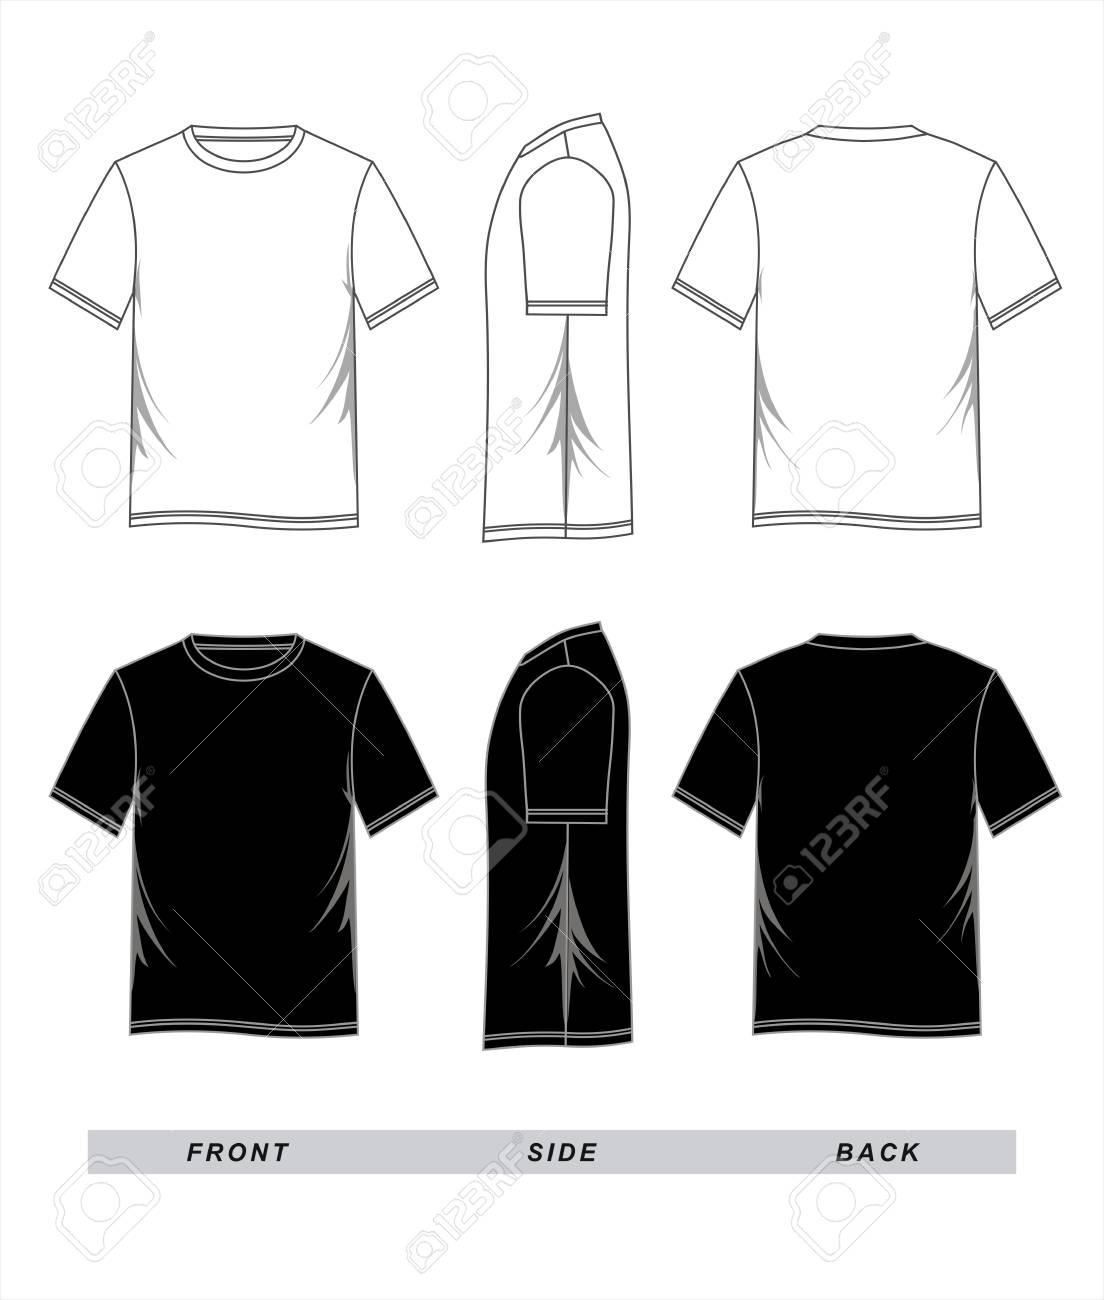 Tshirt Template Vector Illustration Royalty Free Cliparts Vectors